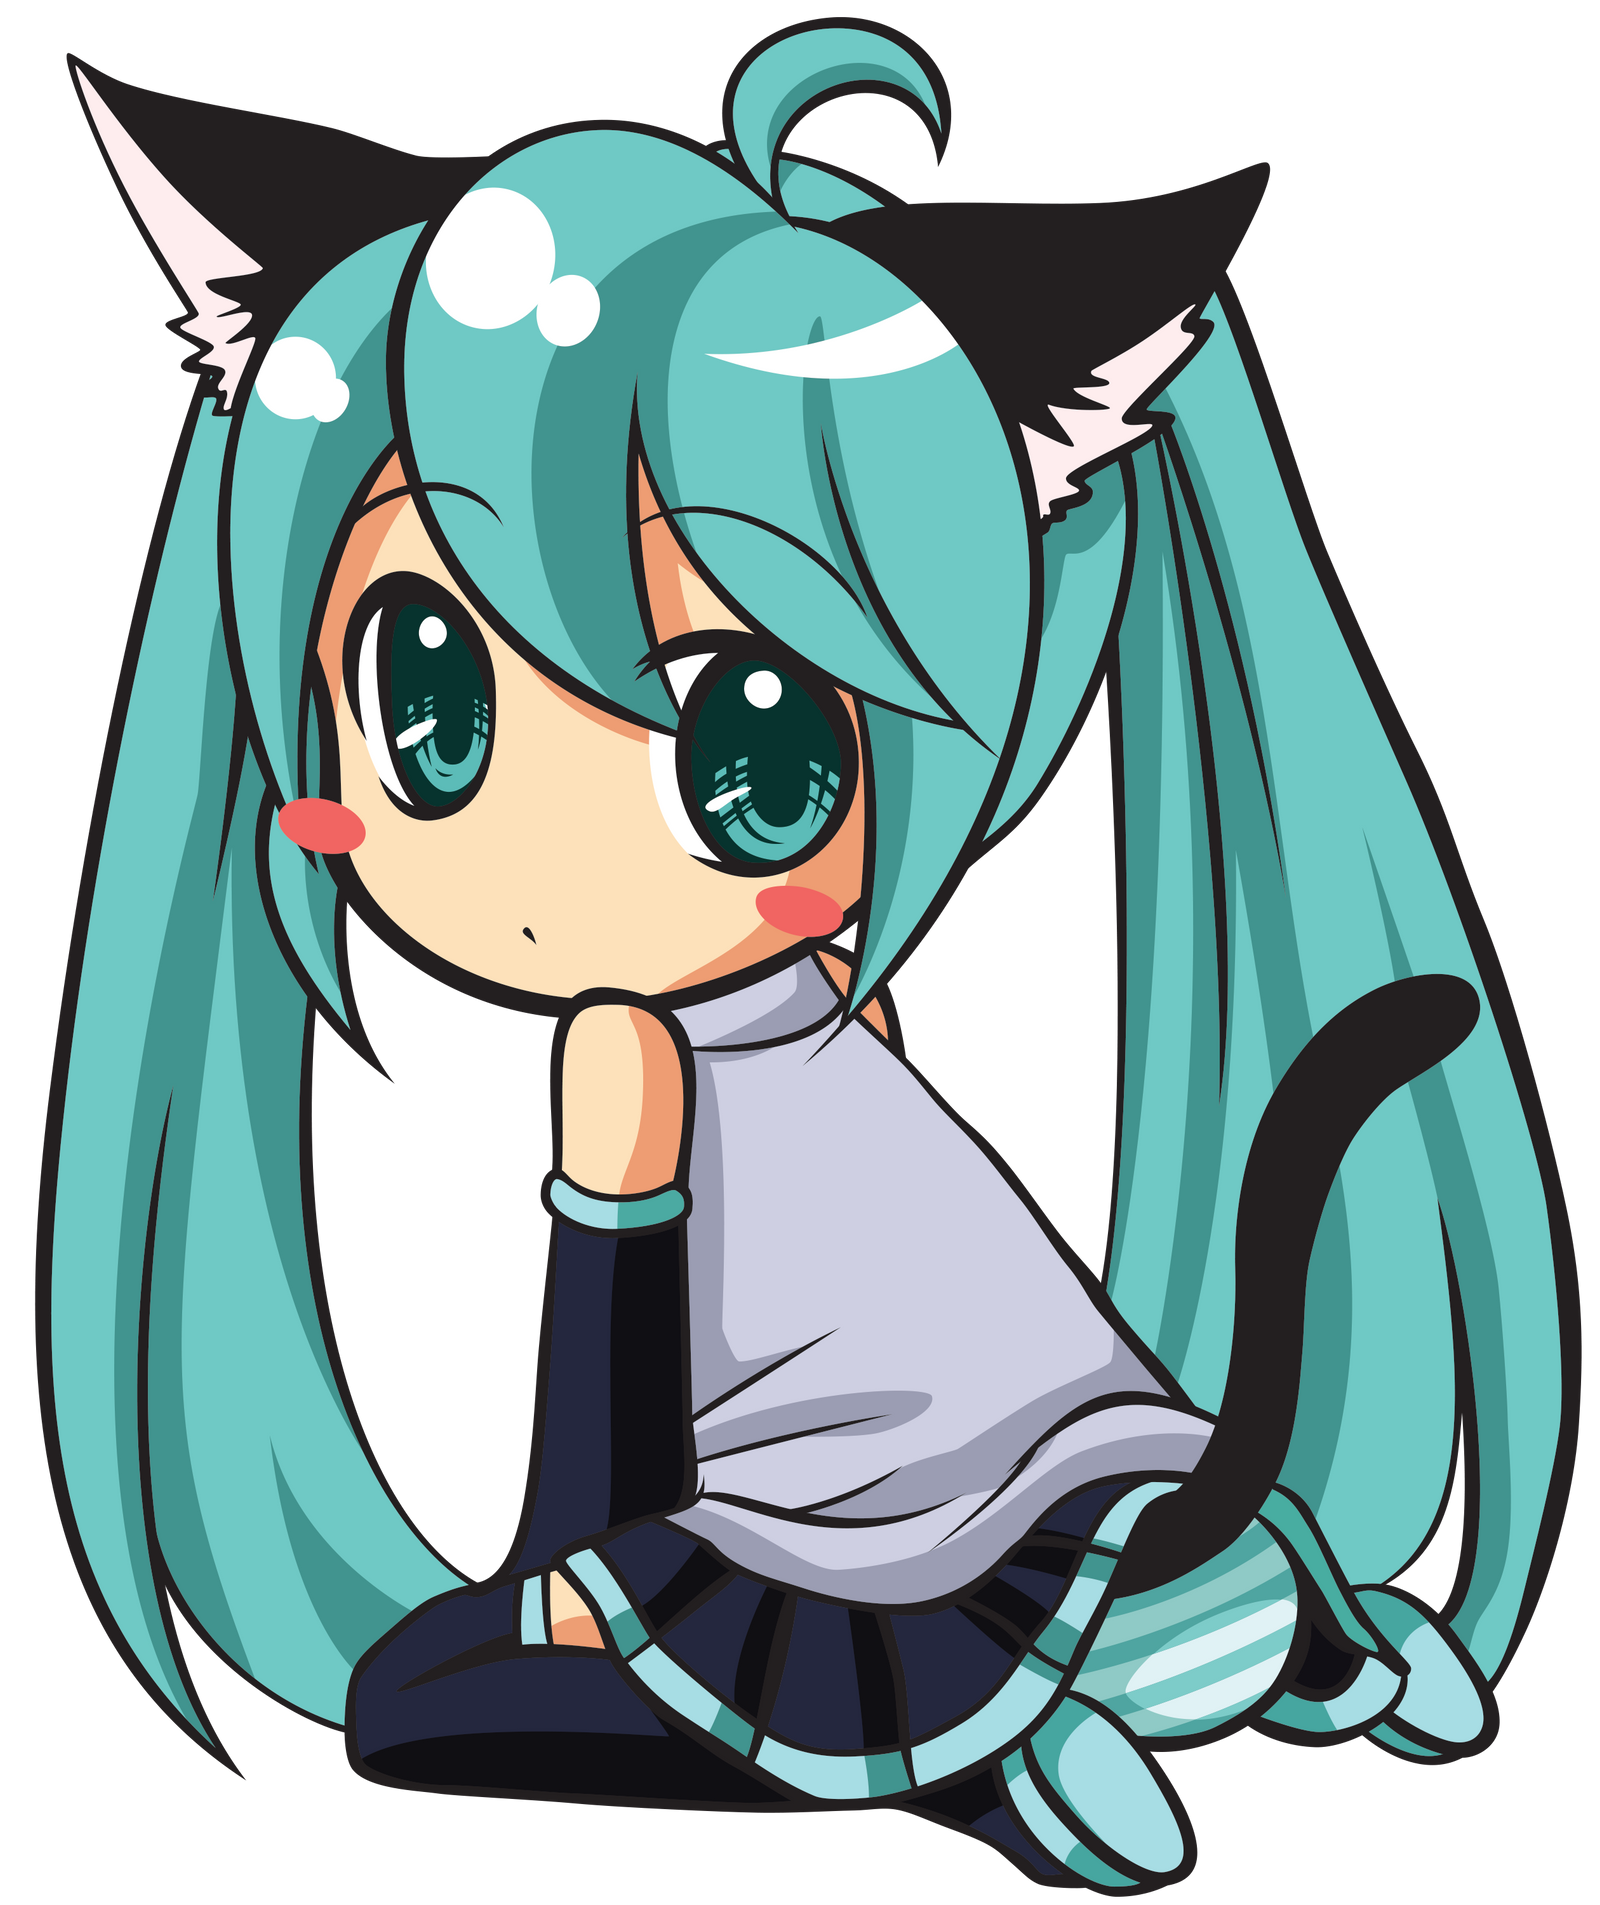 Hatsune Miku Chibi Vector by katsaysmeh on DeviantArt  Hatsune Miku Ch...